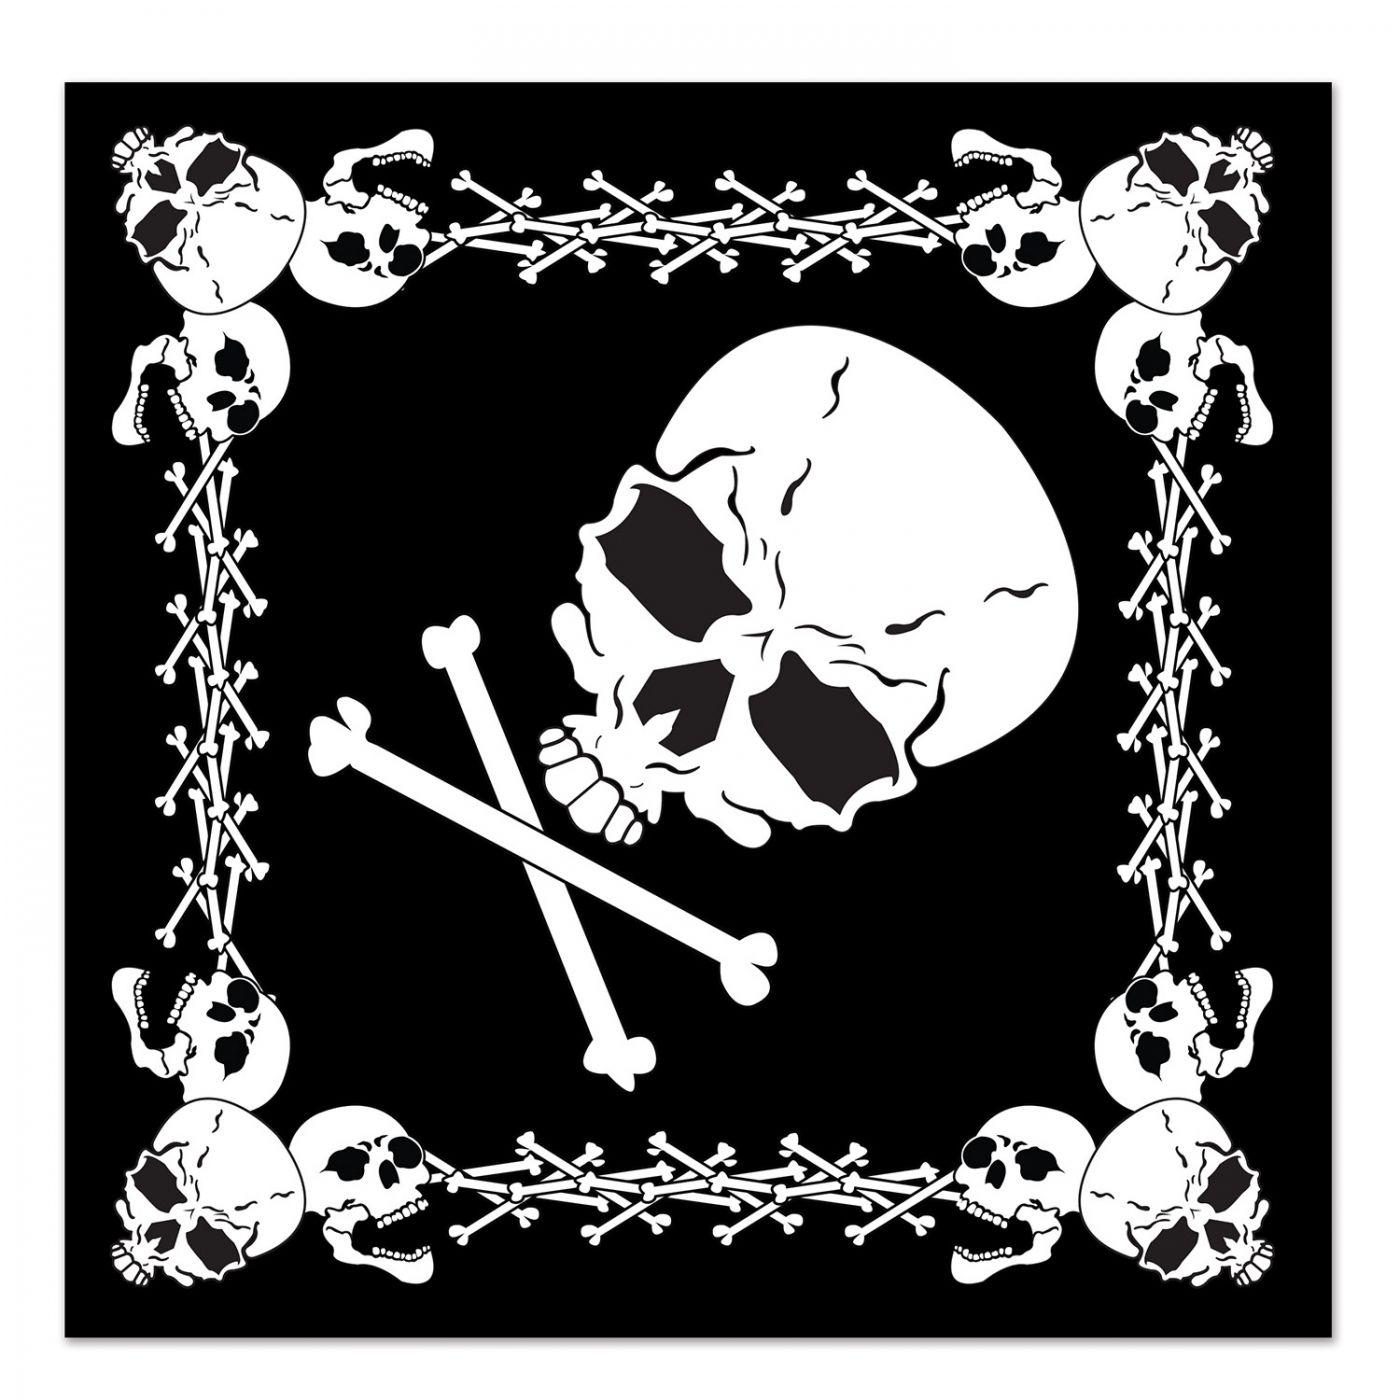 Skull & Crossbones Bandana image